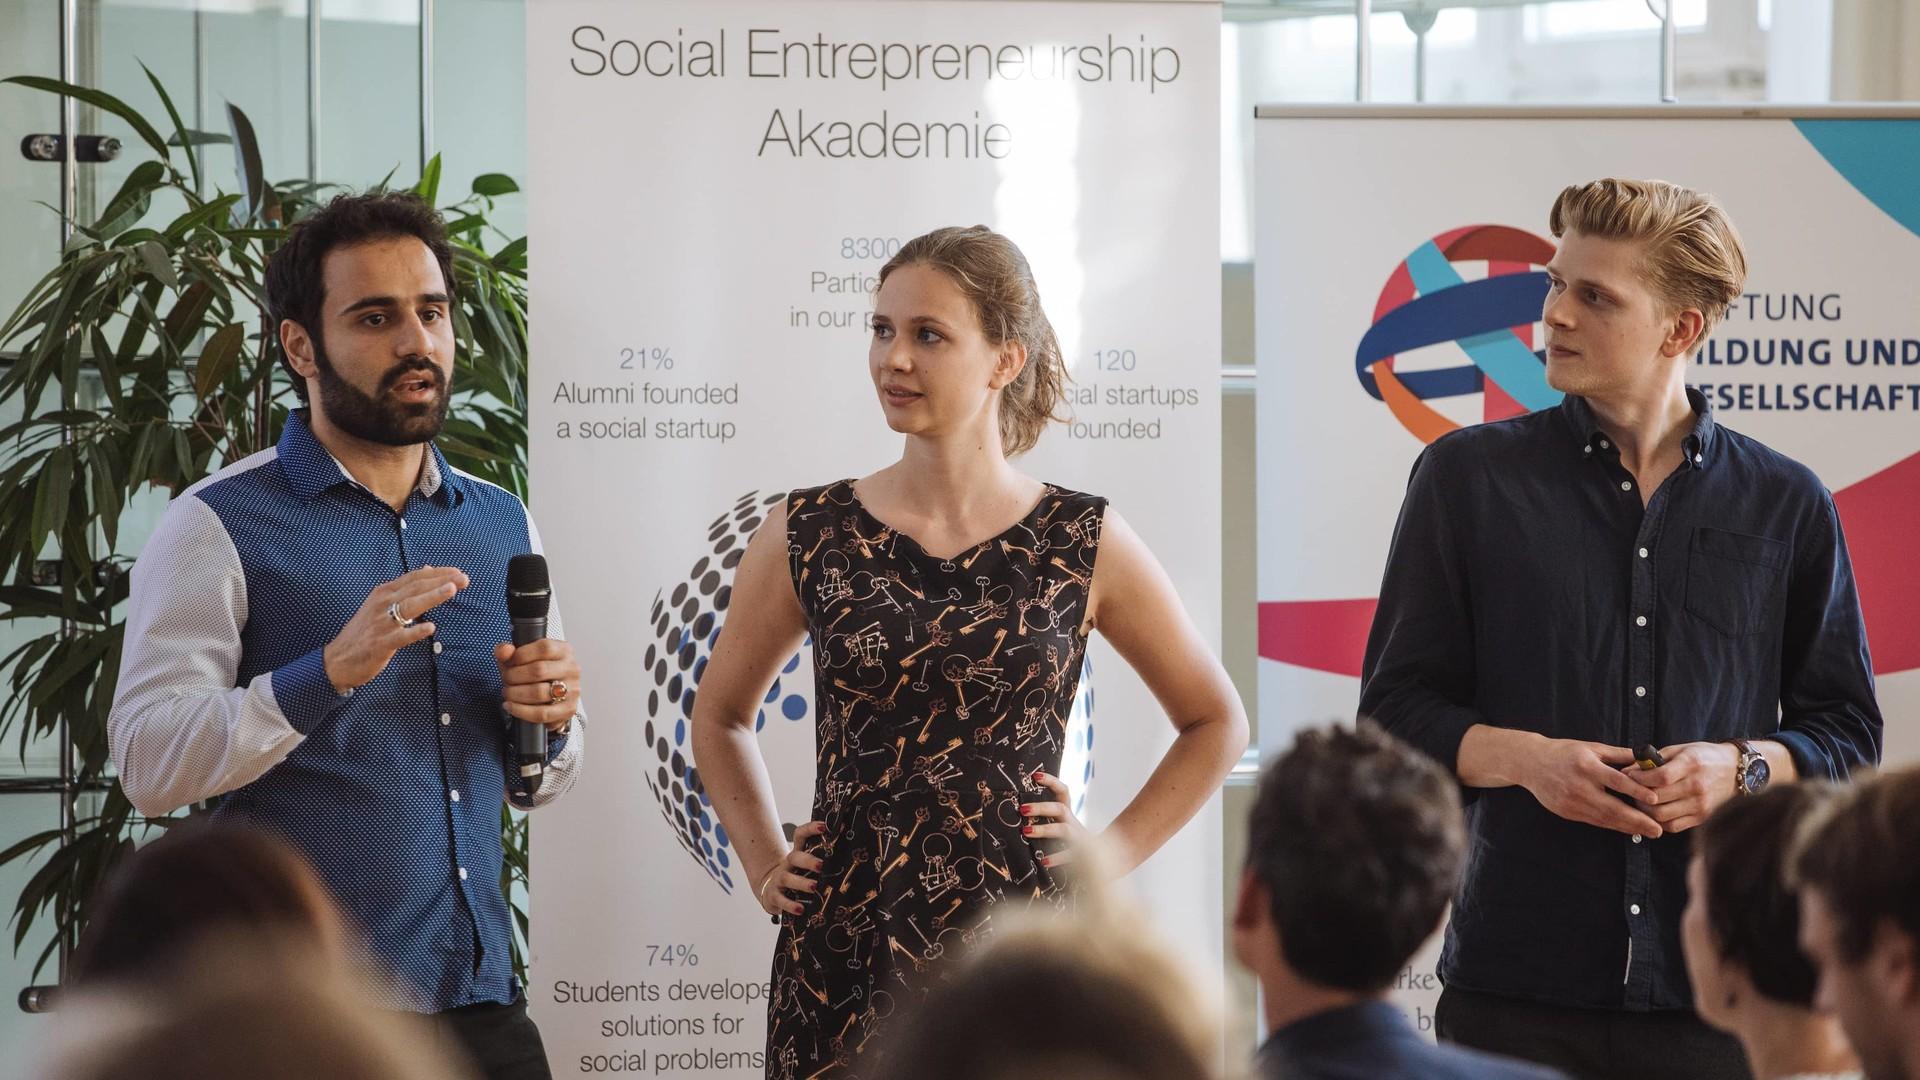 In Munich, social entrepreneurship is thriving  Here's how